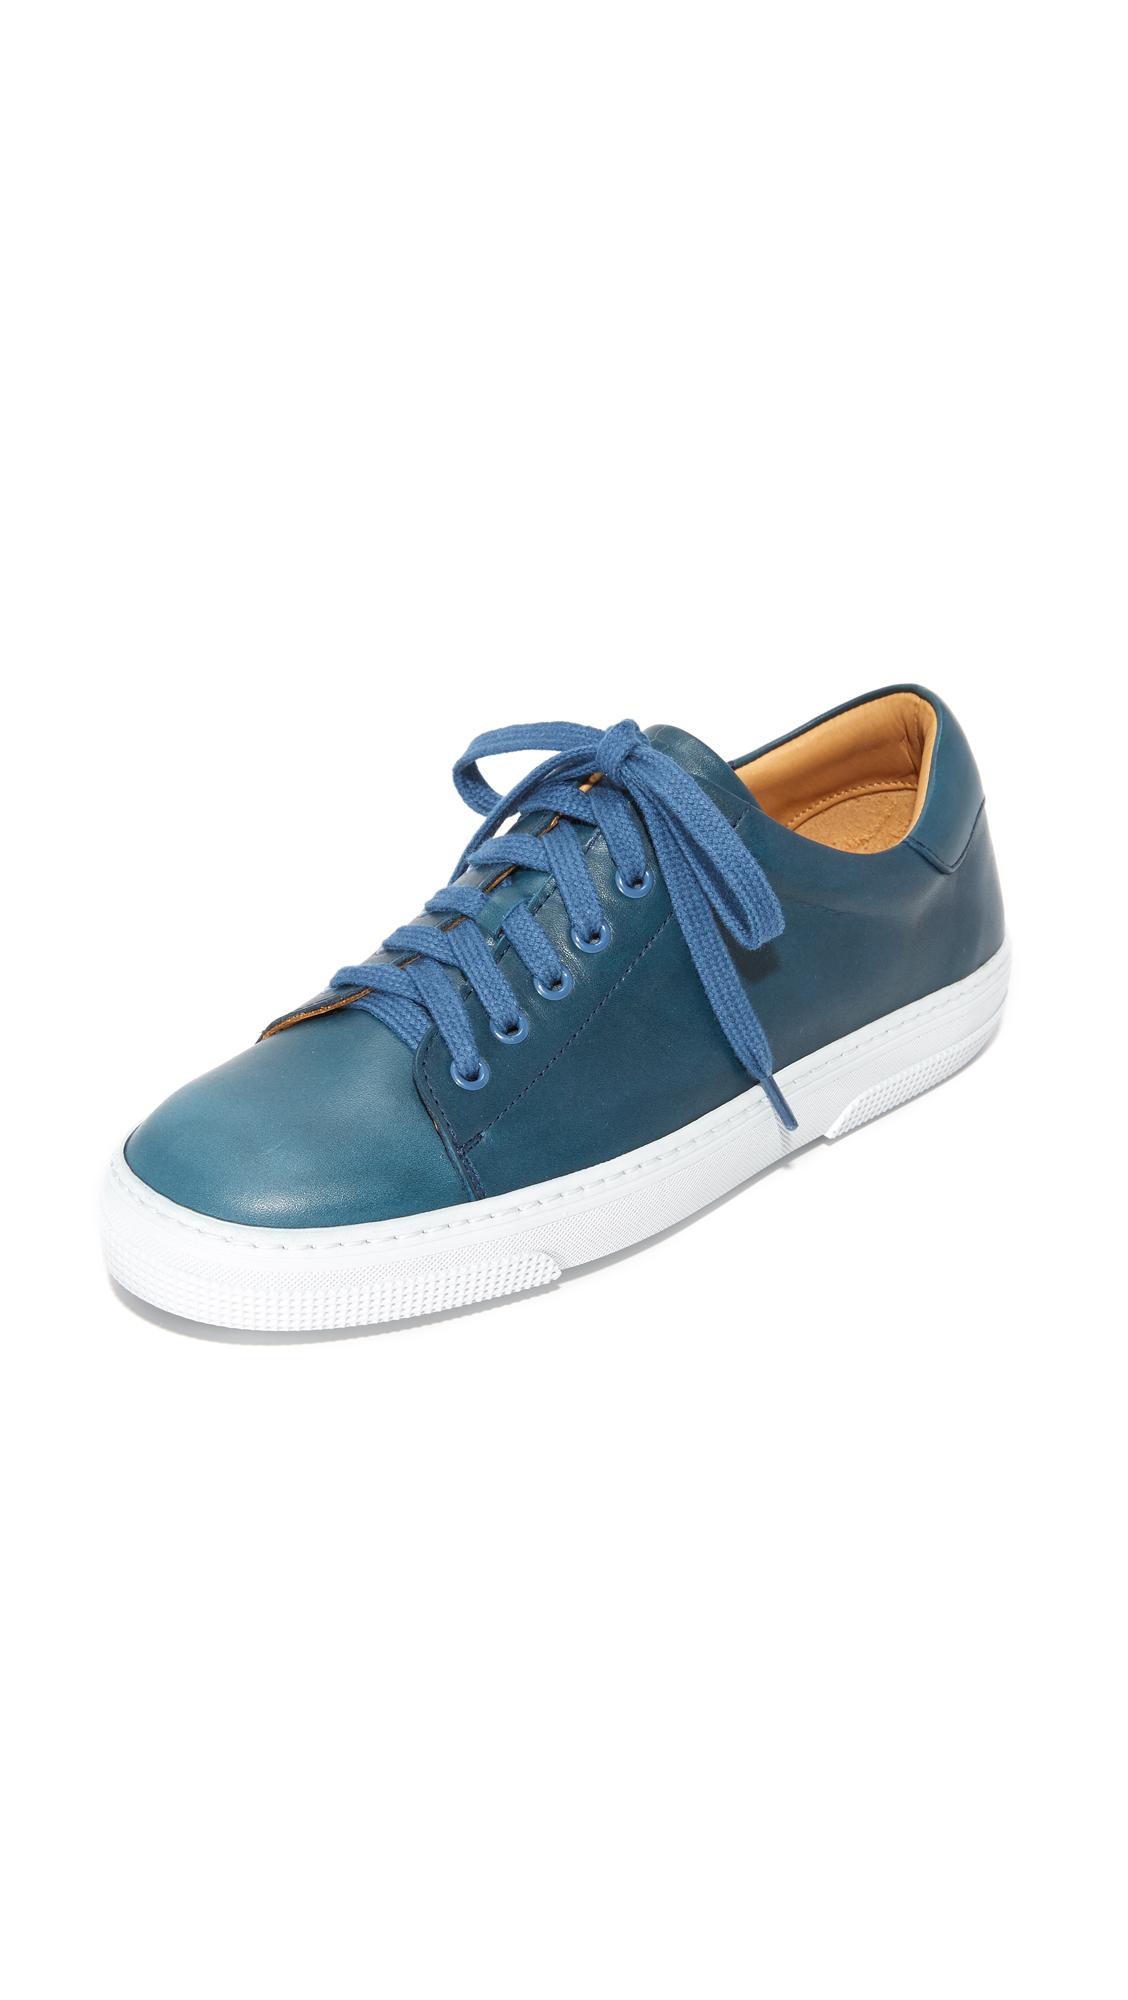 A.P.C. Steffi Tennis Sneakers - Bleu Gris